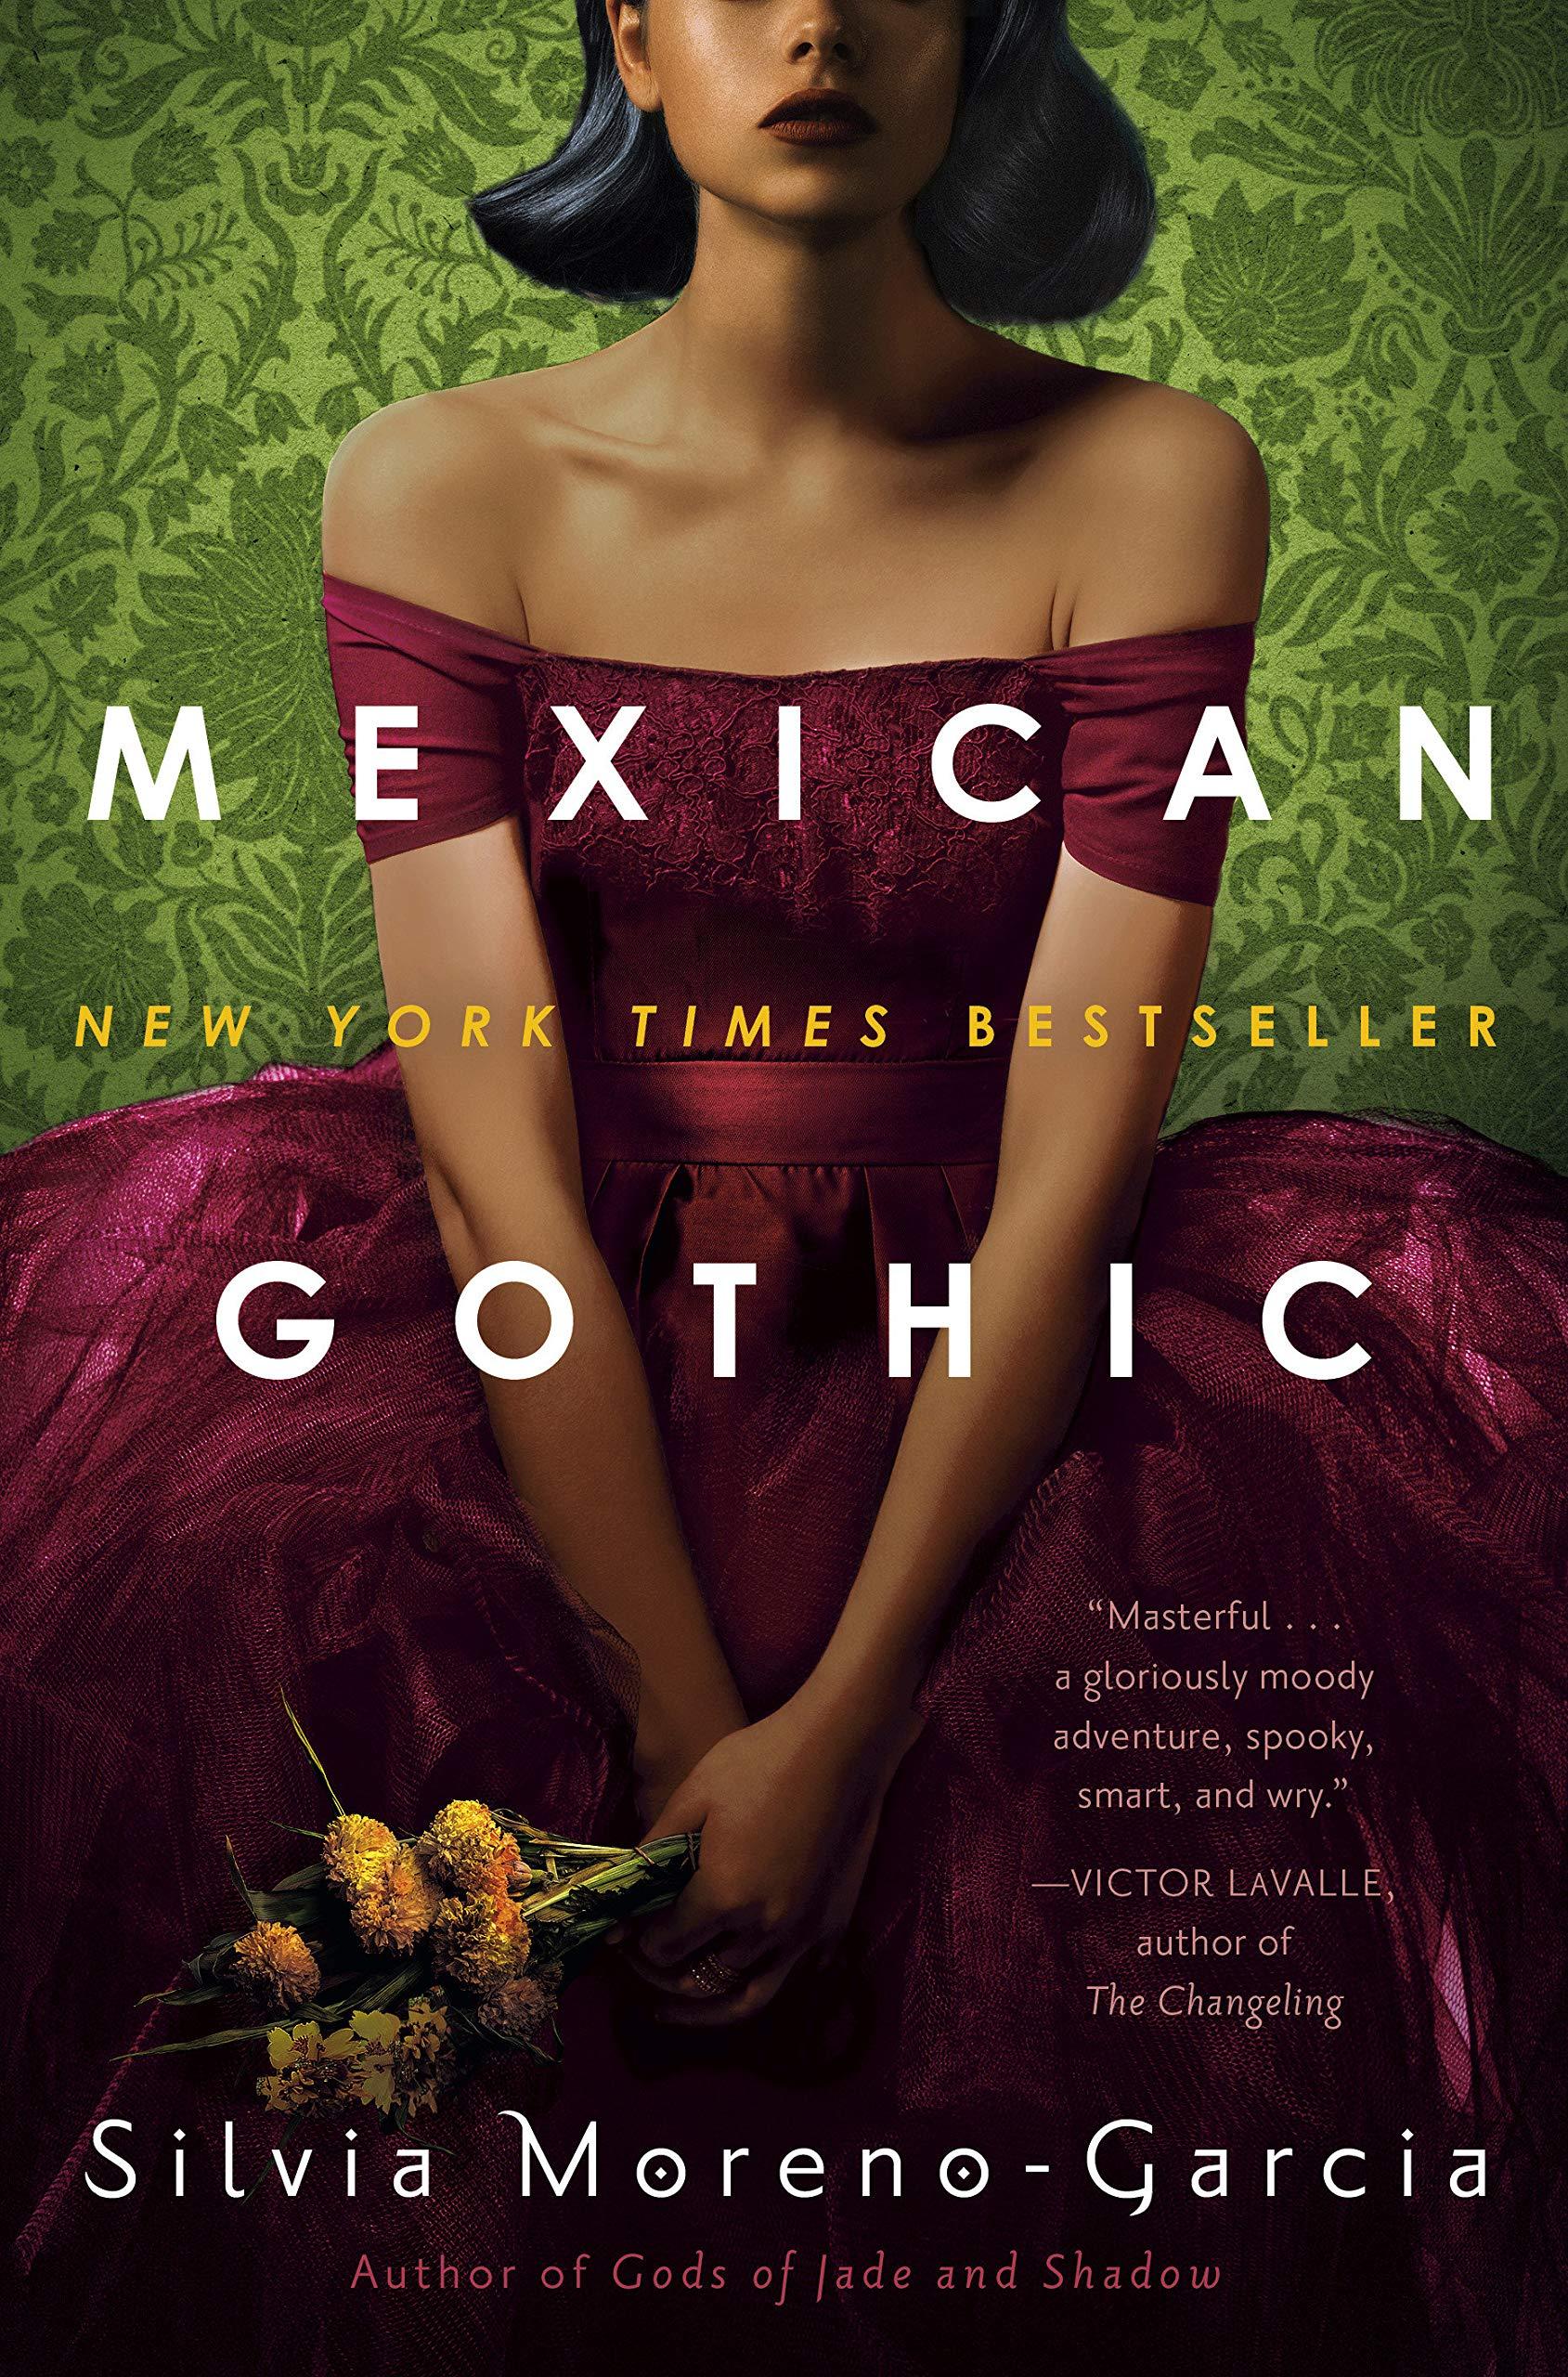 Mexican Gothic: Amazon.co.uk: Moreno-Garcia, Silvi: 9780525620785: Books